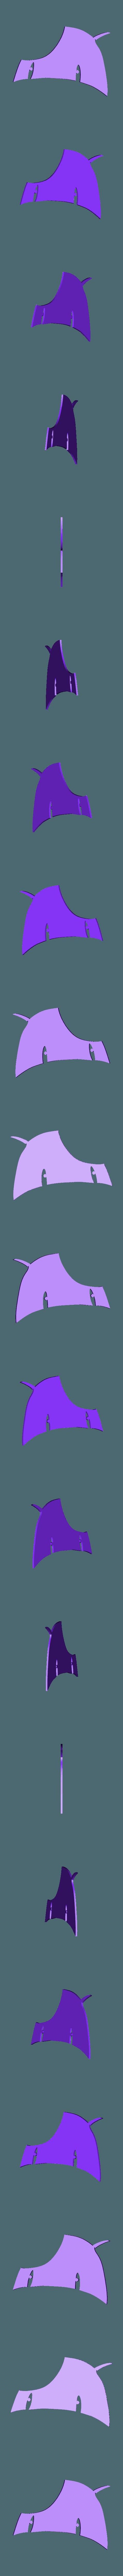 Head.stl Download free STL file Cow - Harvest Moon • 3D print model, JayOmega